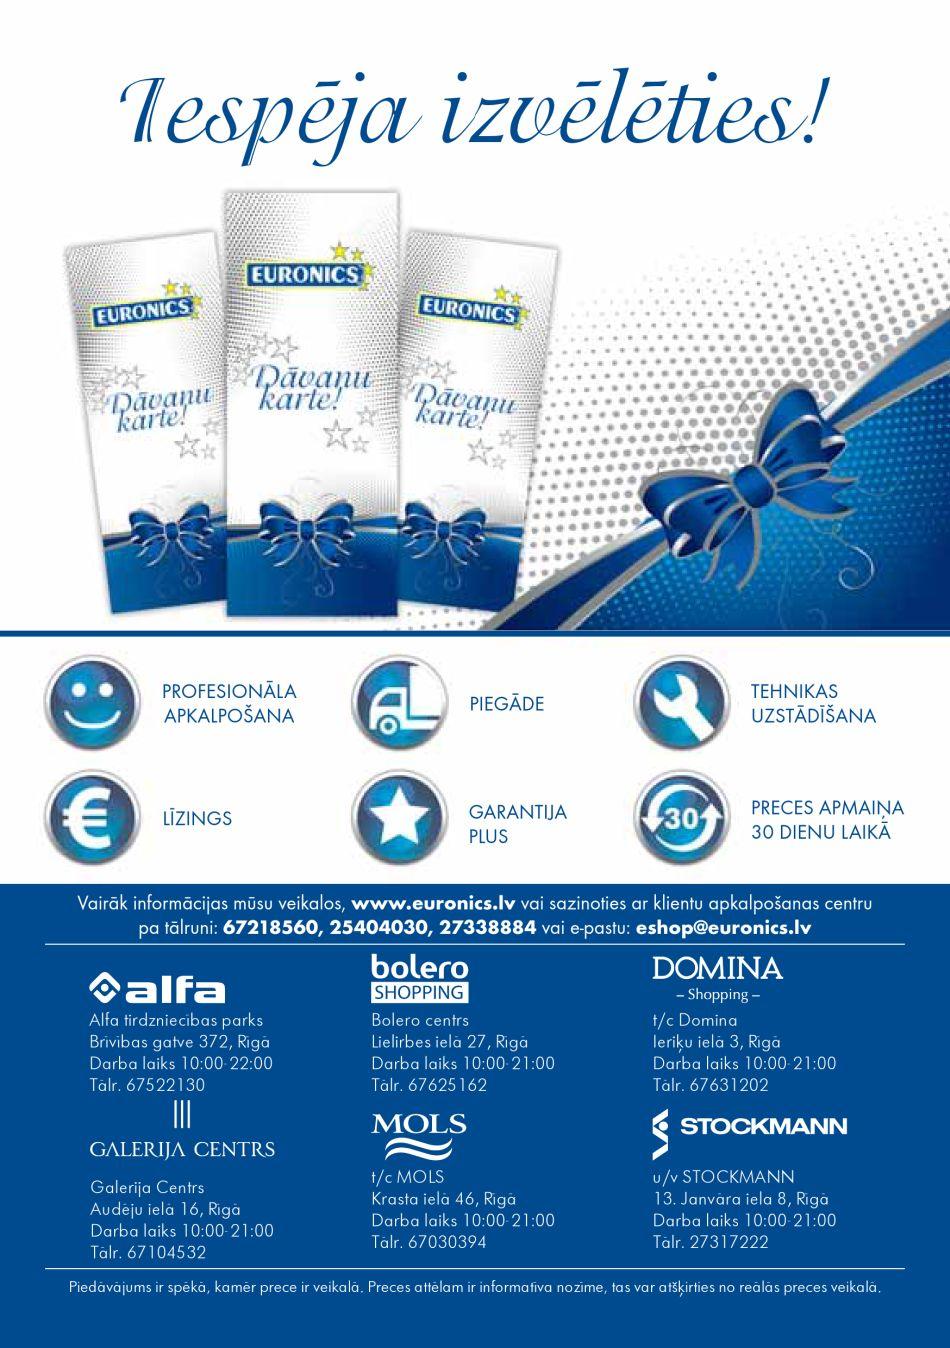 EURONICS akcijas buklets 01.12.2016 - 31.12.2016